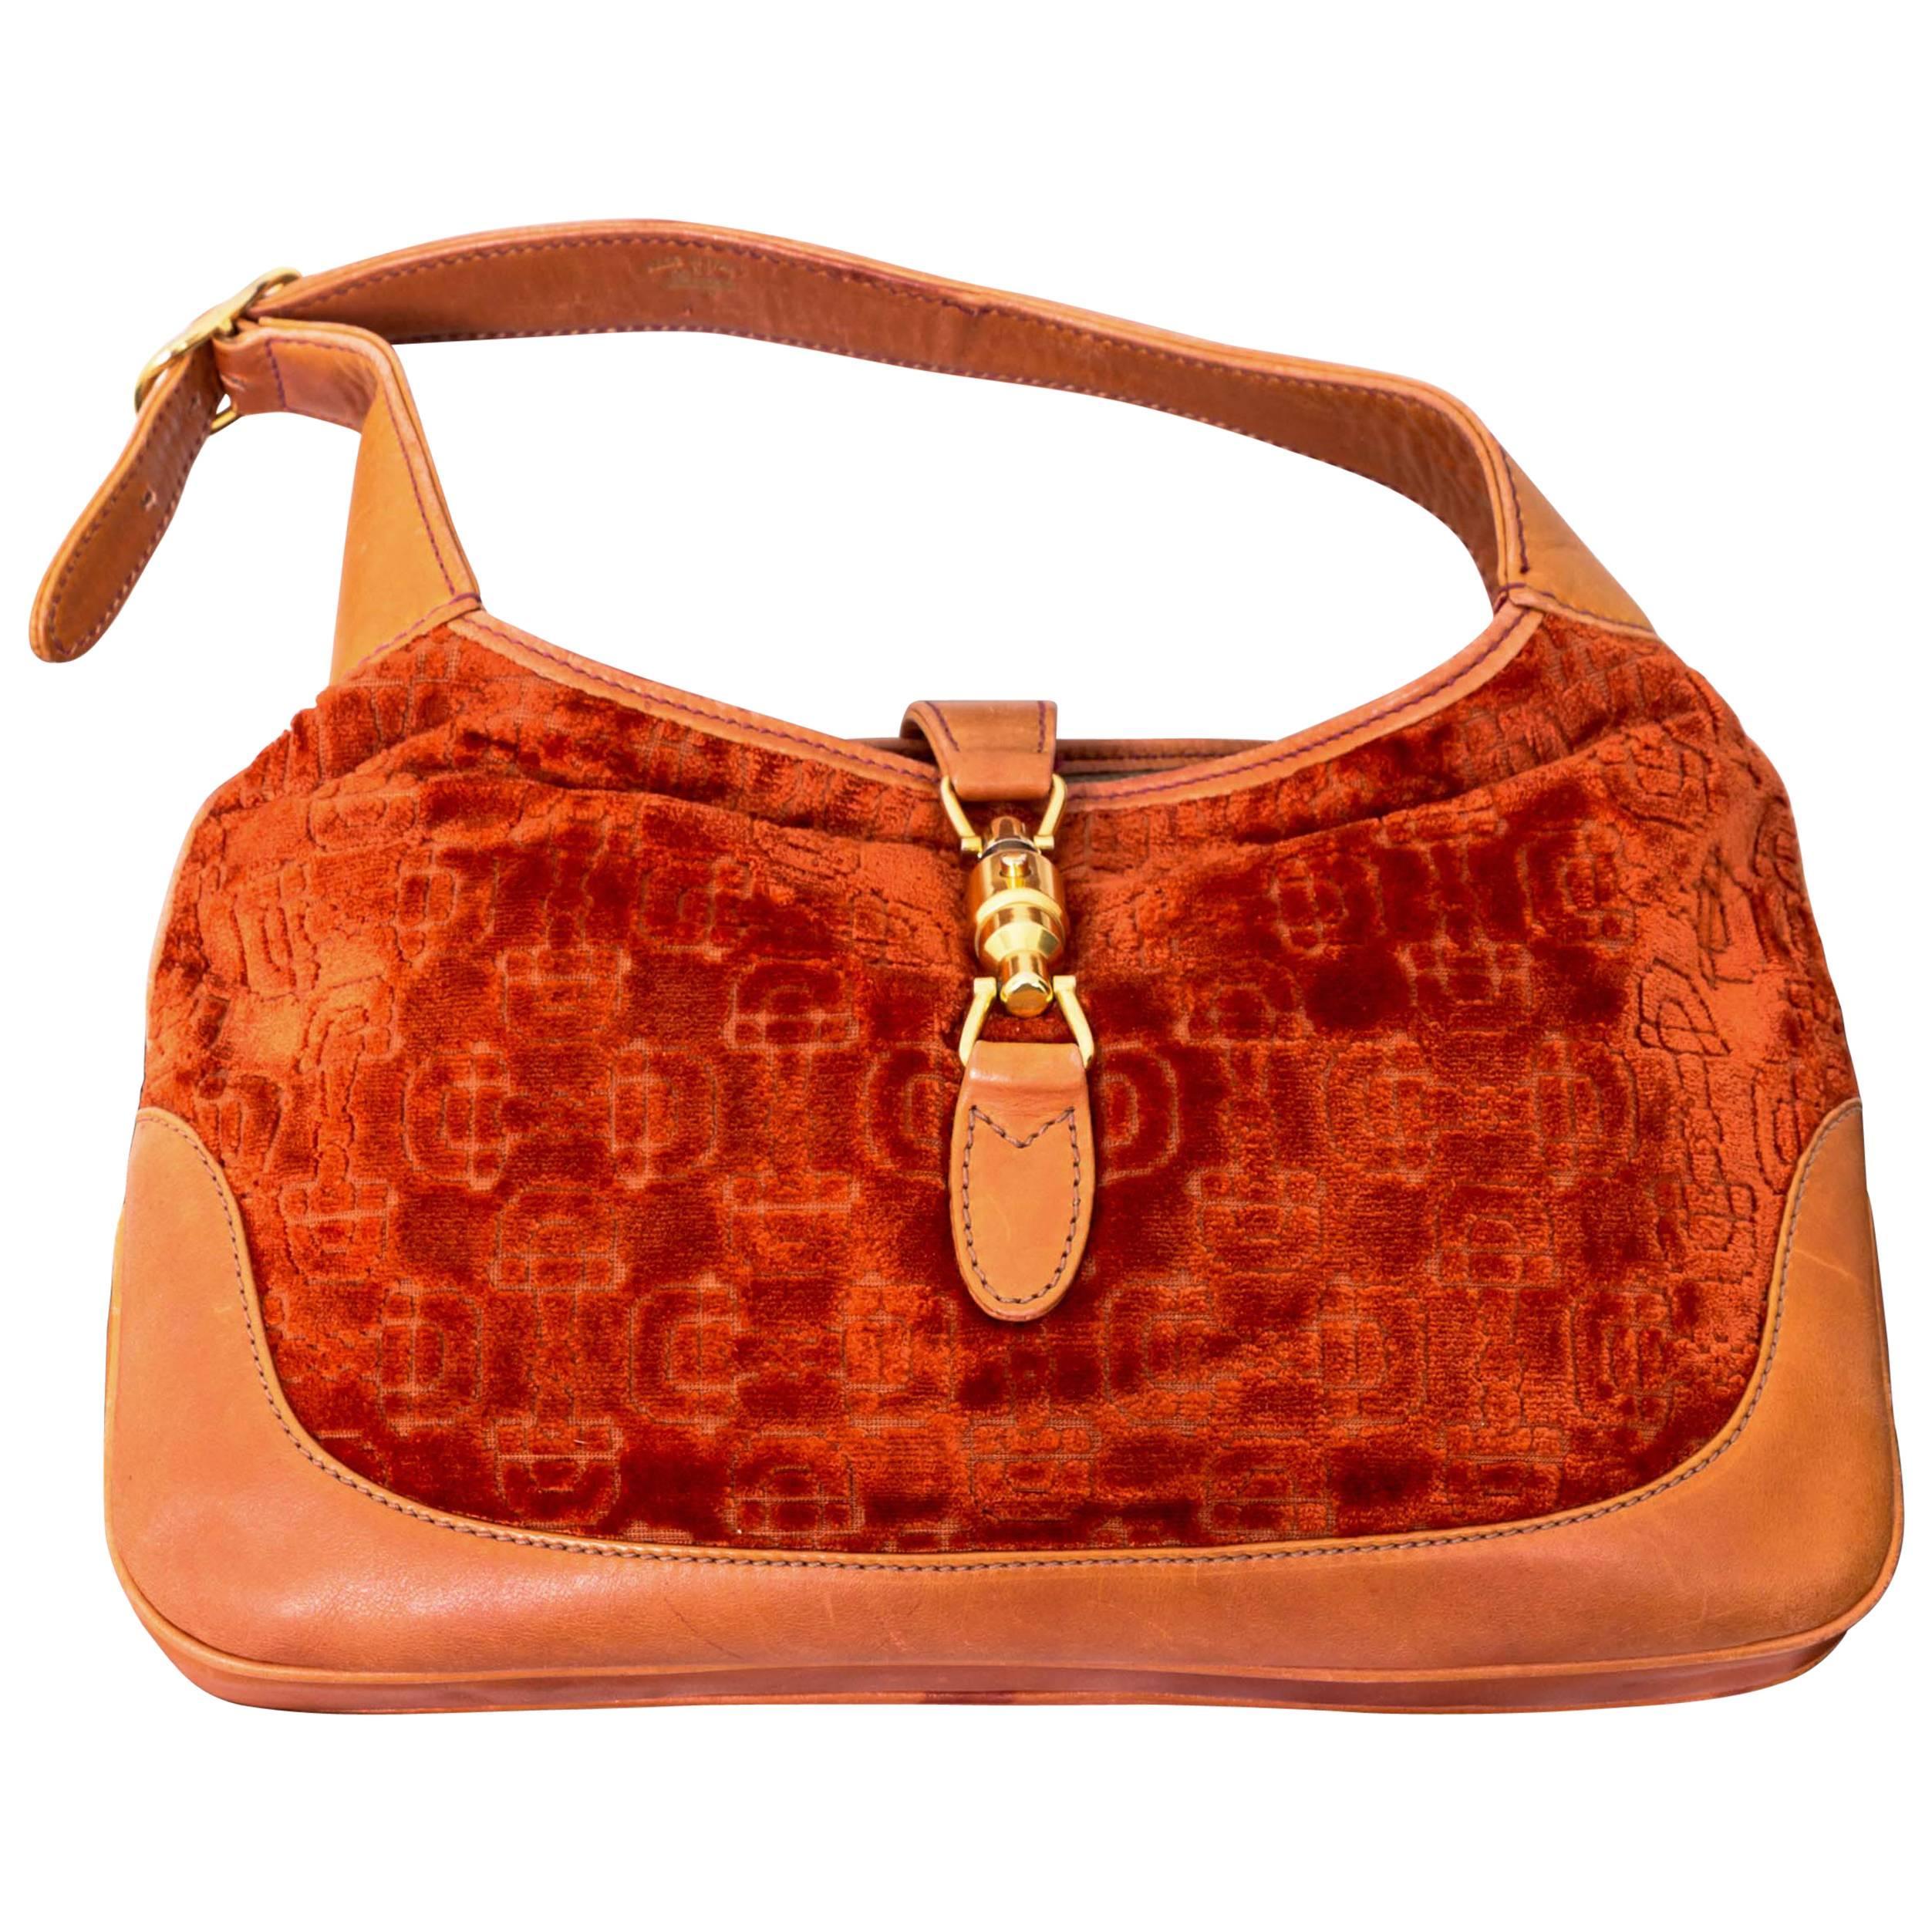 12c261617f39f Original Vintage Gucci Jackie O Bag with Velvet Horse-Bit Motif by Funky  Finders